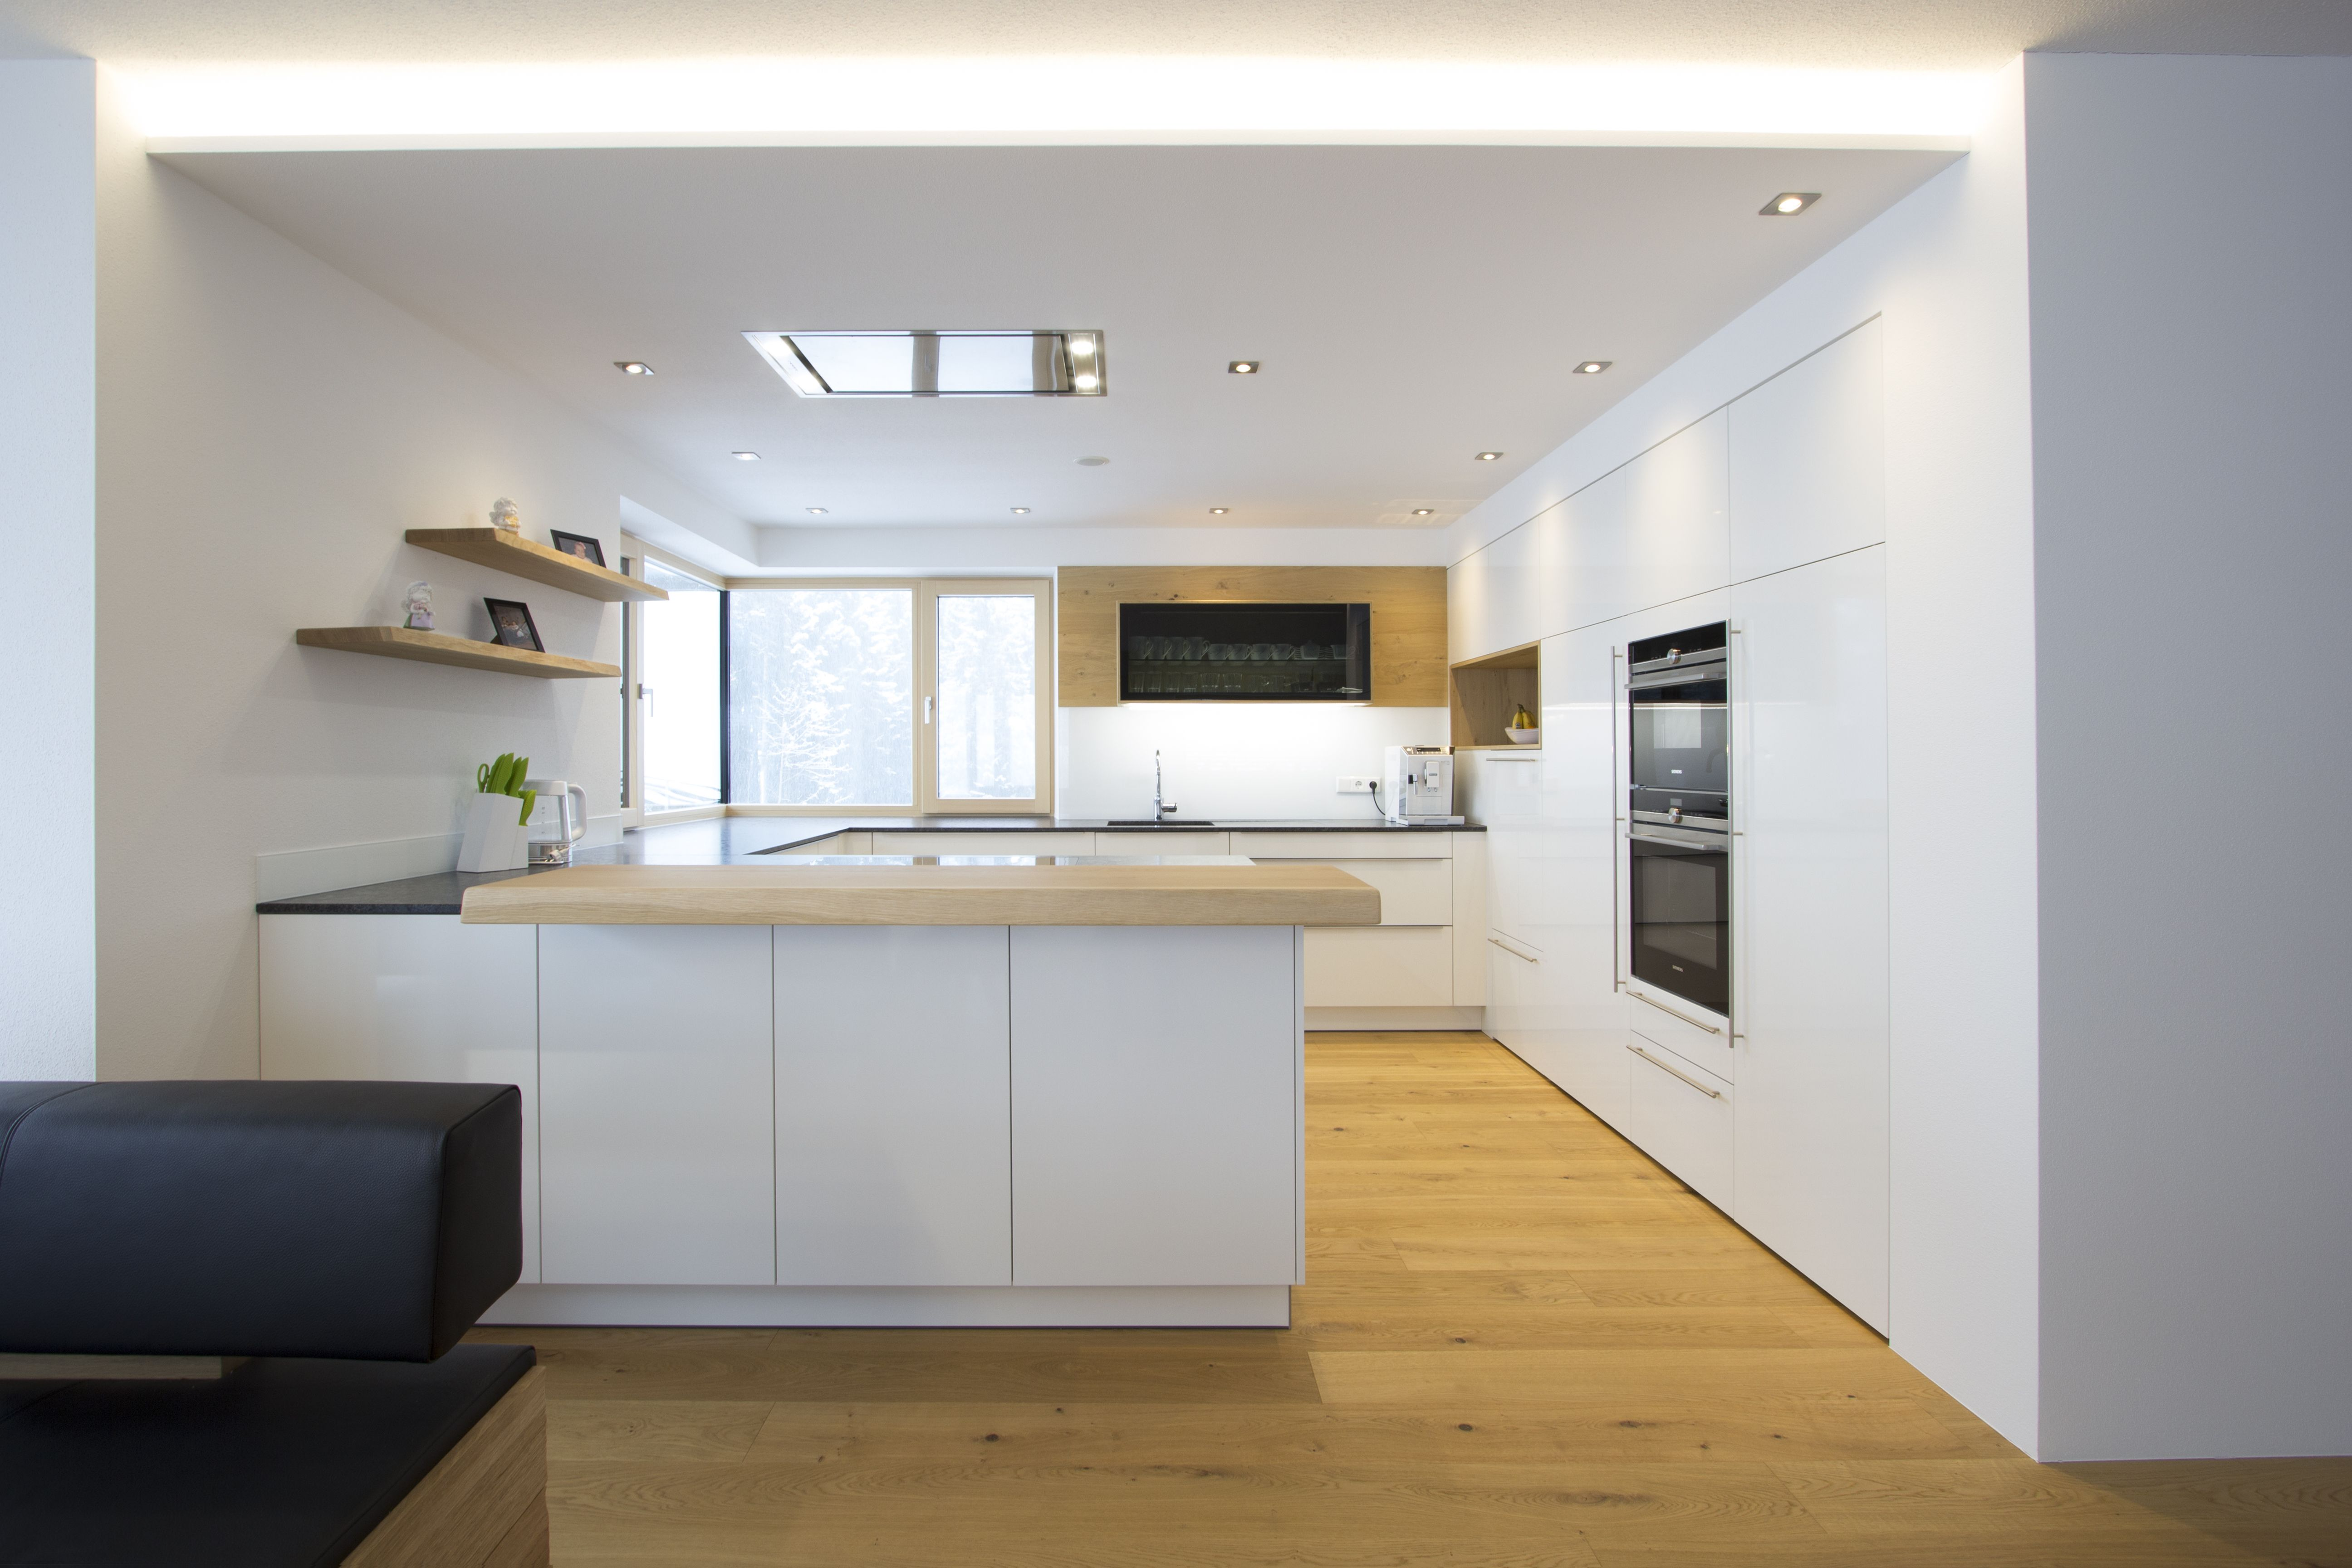 Beste Wohnküche Design Layout Ideen - Küchen Design Ideen ...